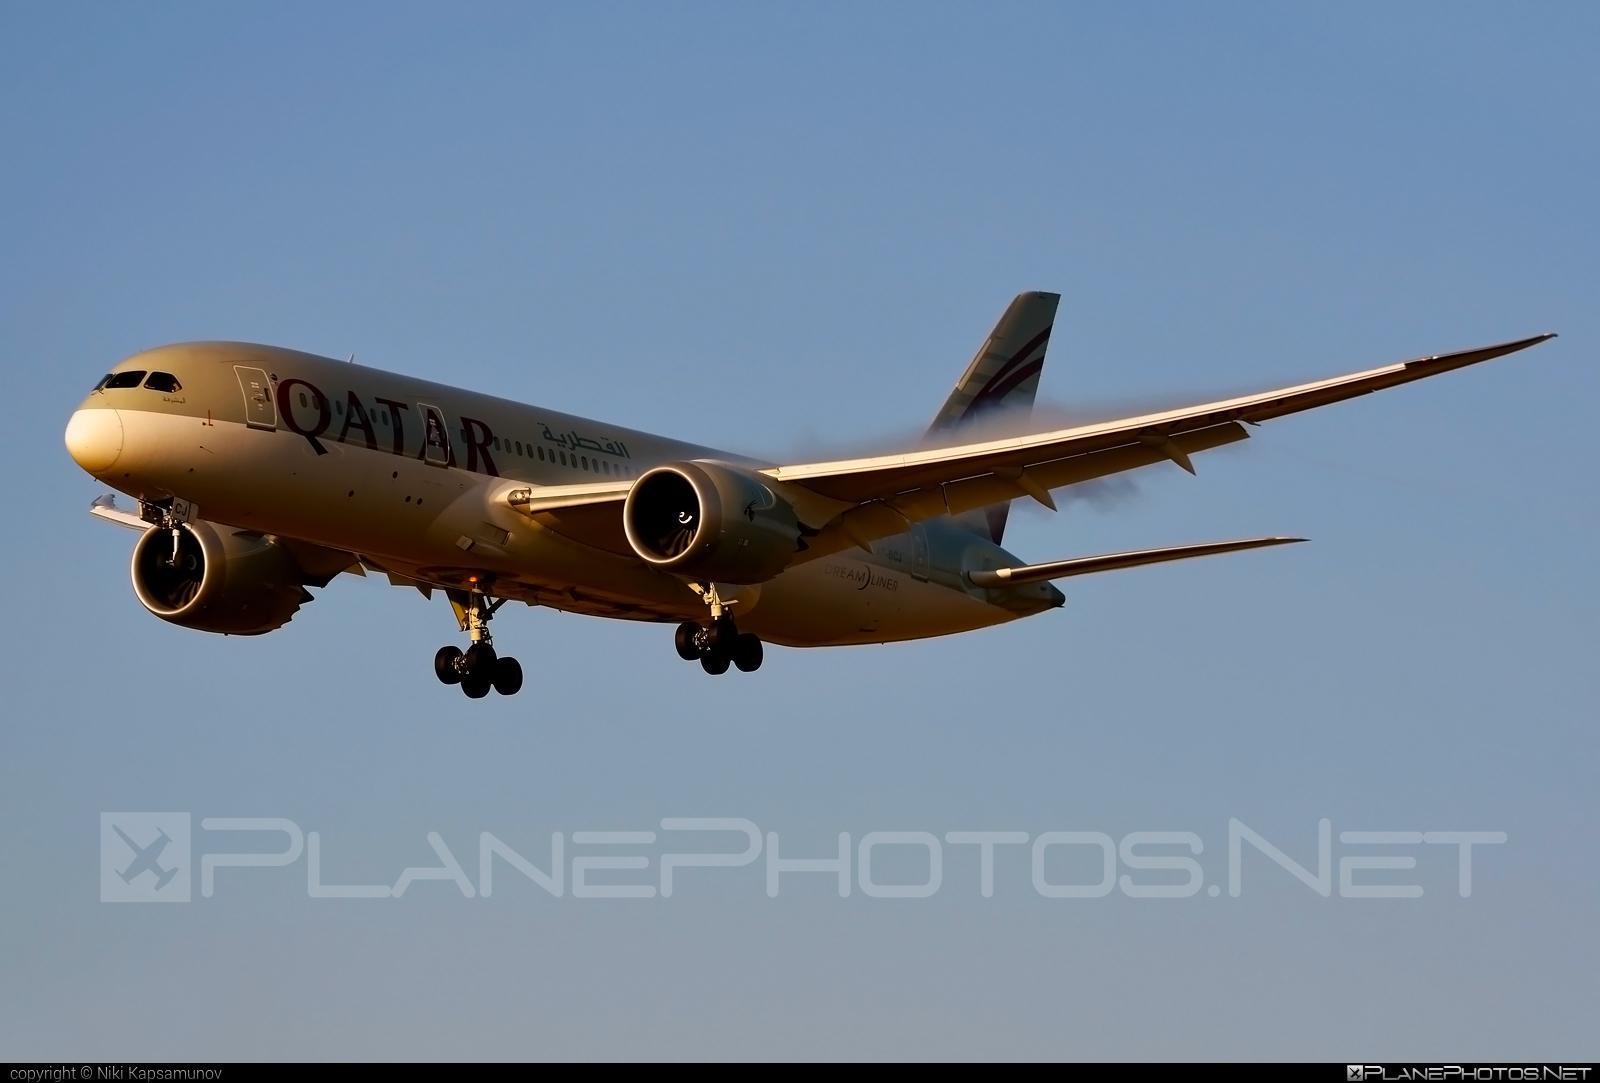 Boeing 787-8 Dreamliner - A7-BCJ operated by Qatar Airways #b787 #boeing #boeing787 #dreamliner #qatarairways